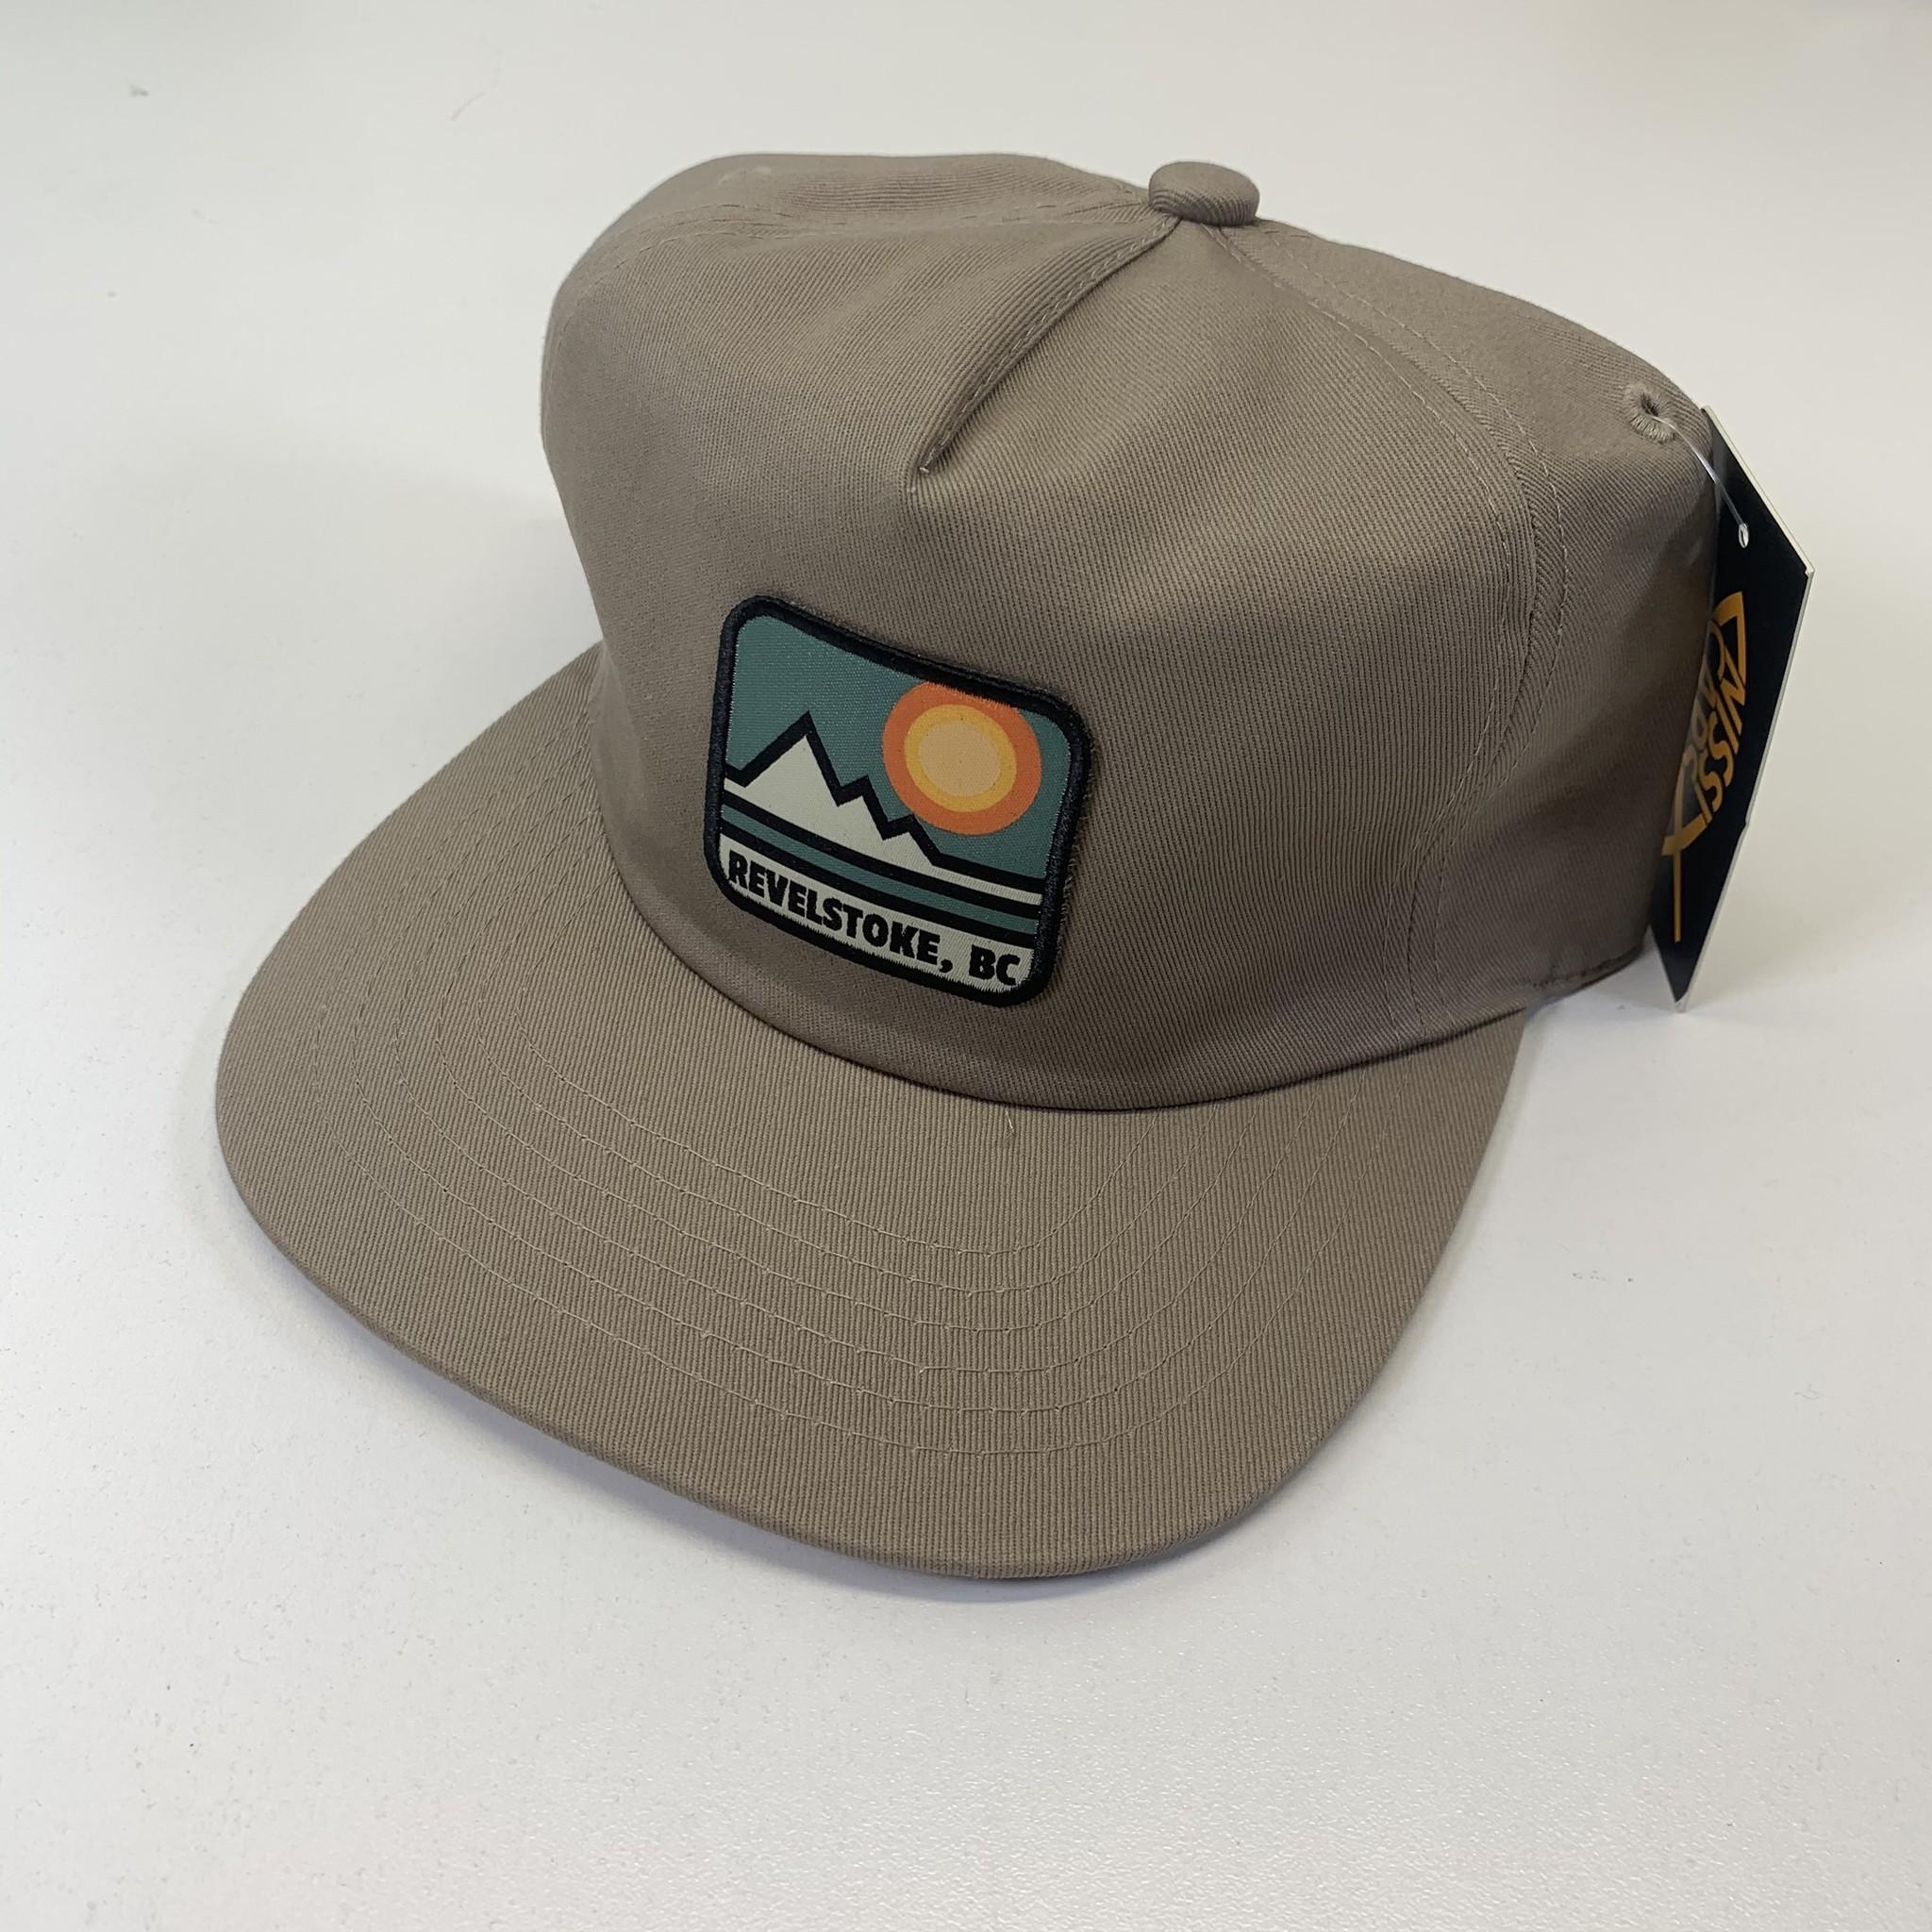 Trading Co. Revelstoke - Retro Patch Cap (Khaki)